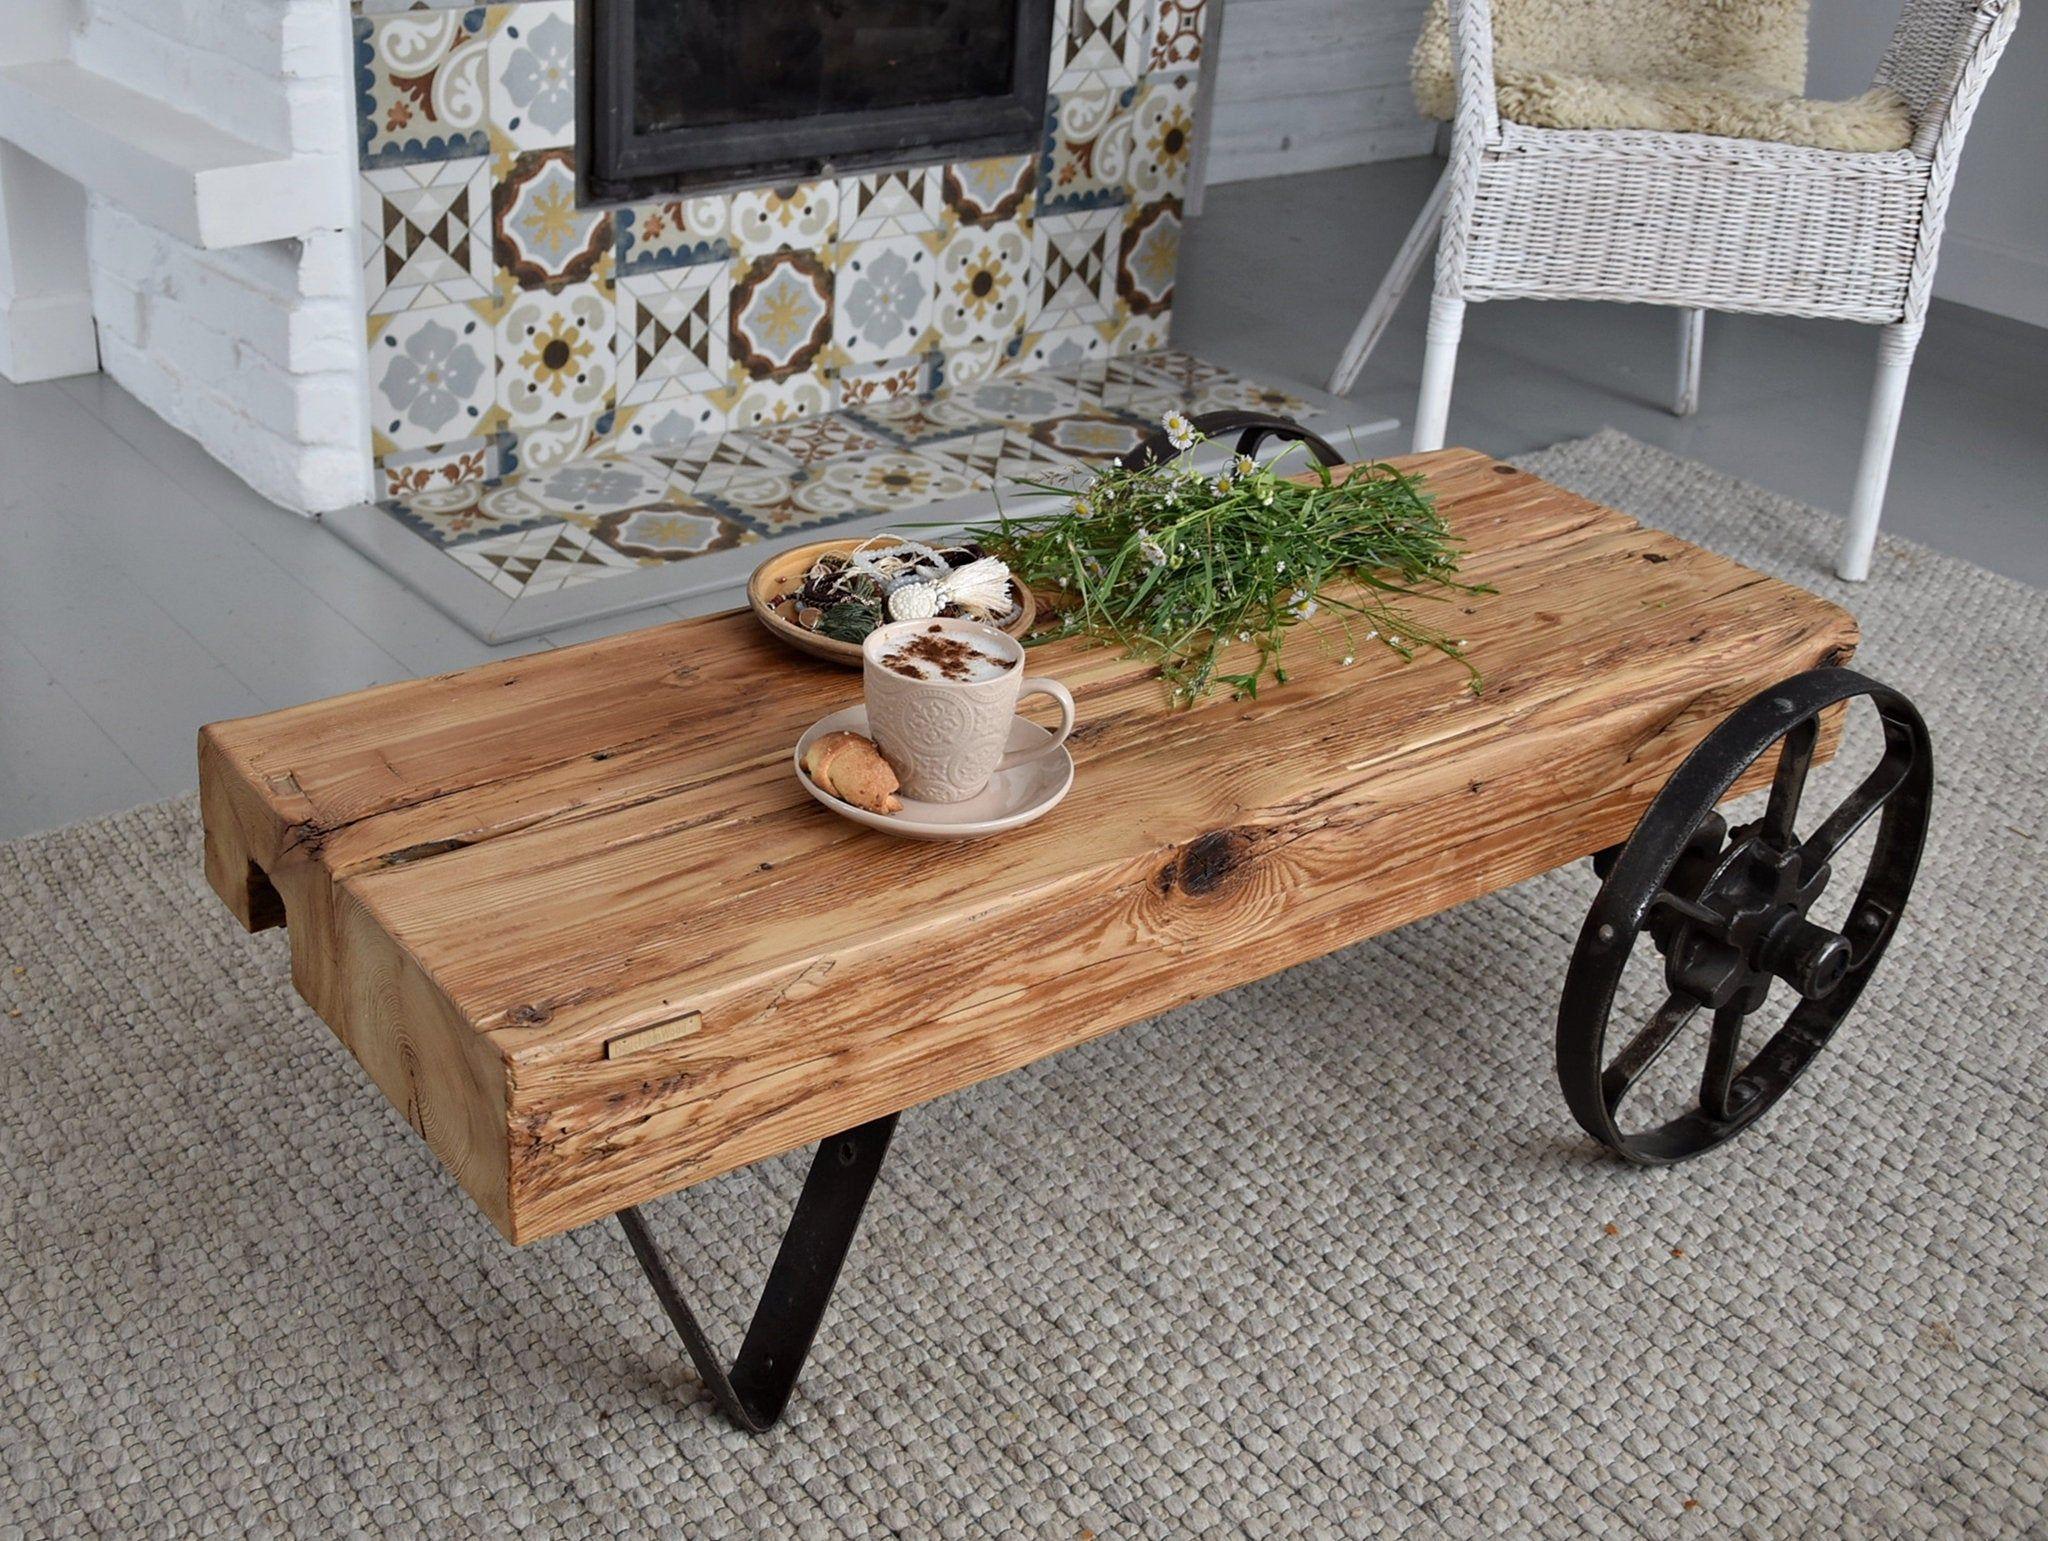 Unique Industrial Factory Cart Coffee Table Vintage Industrial Reclaimed Barn Wood Antiqu Cart Coffee Table Rustic Industrial Coffee Table Coffee Table Vintage [ 1541 x 2048 Pixel ]